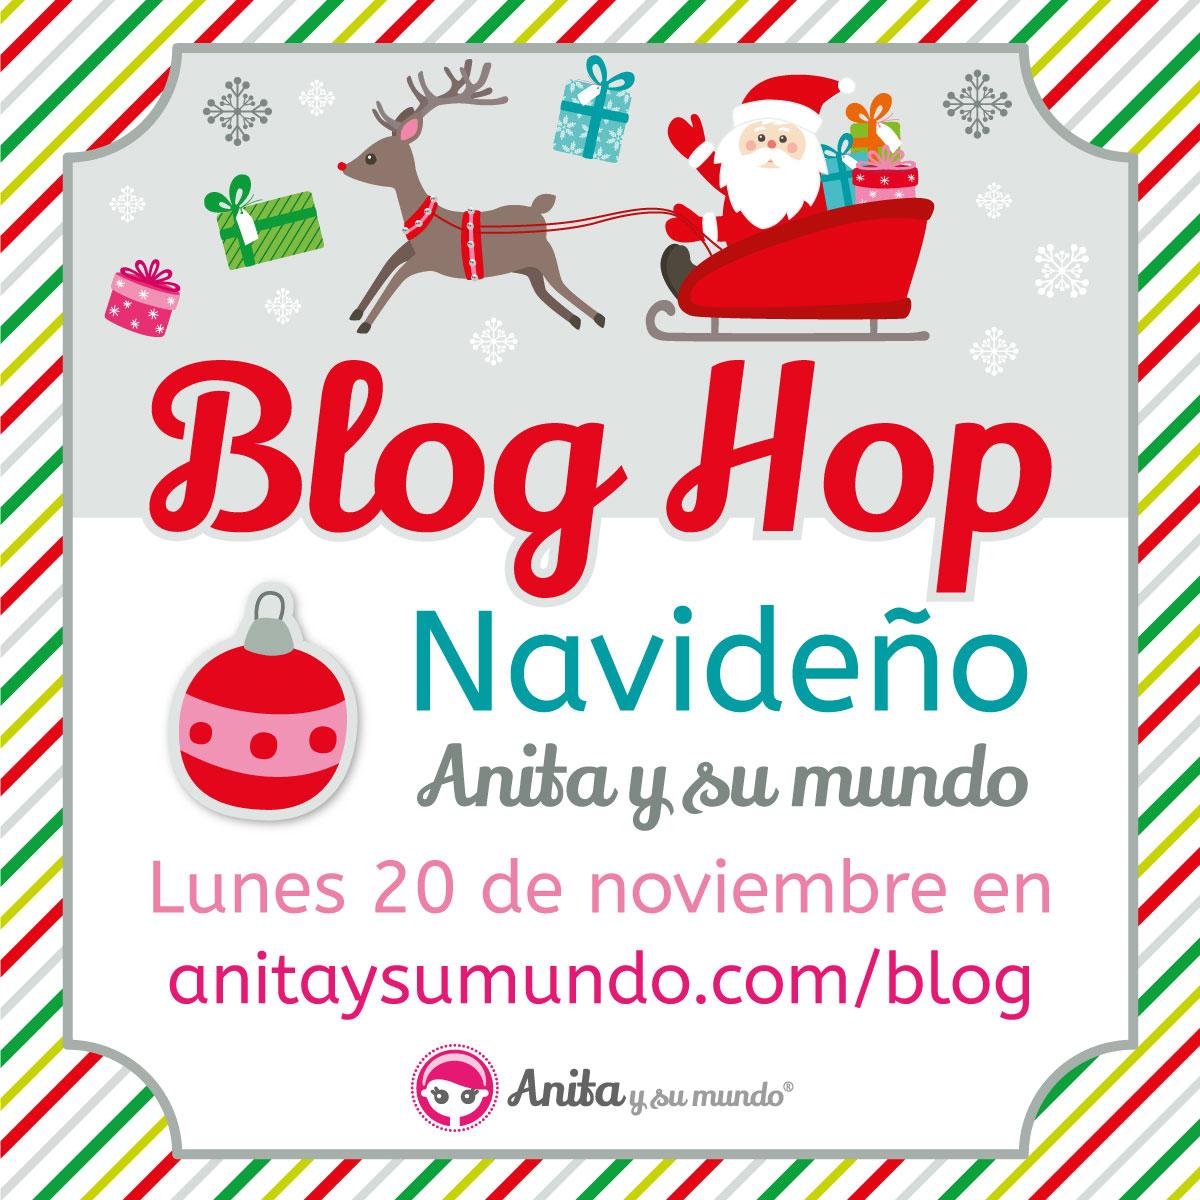 blog hop navideño 2017